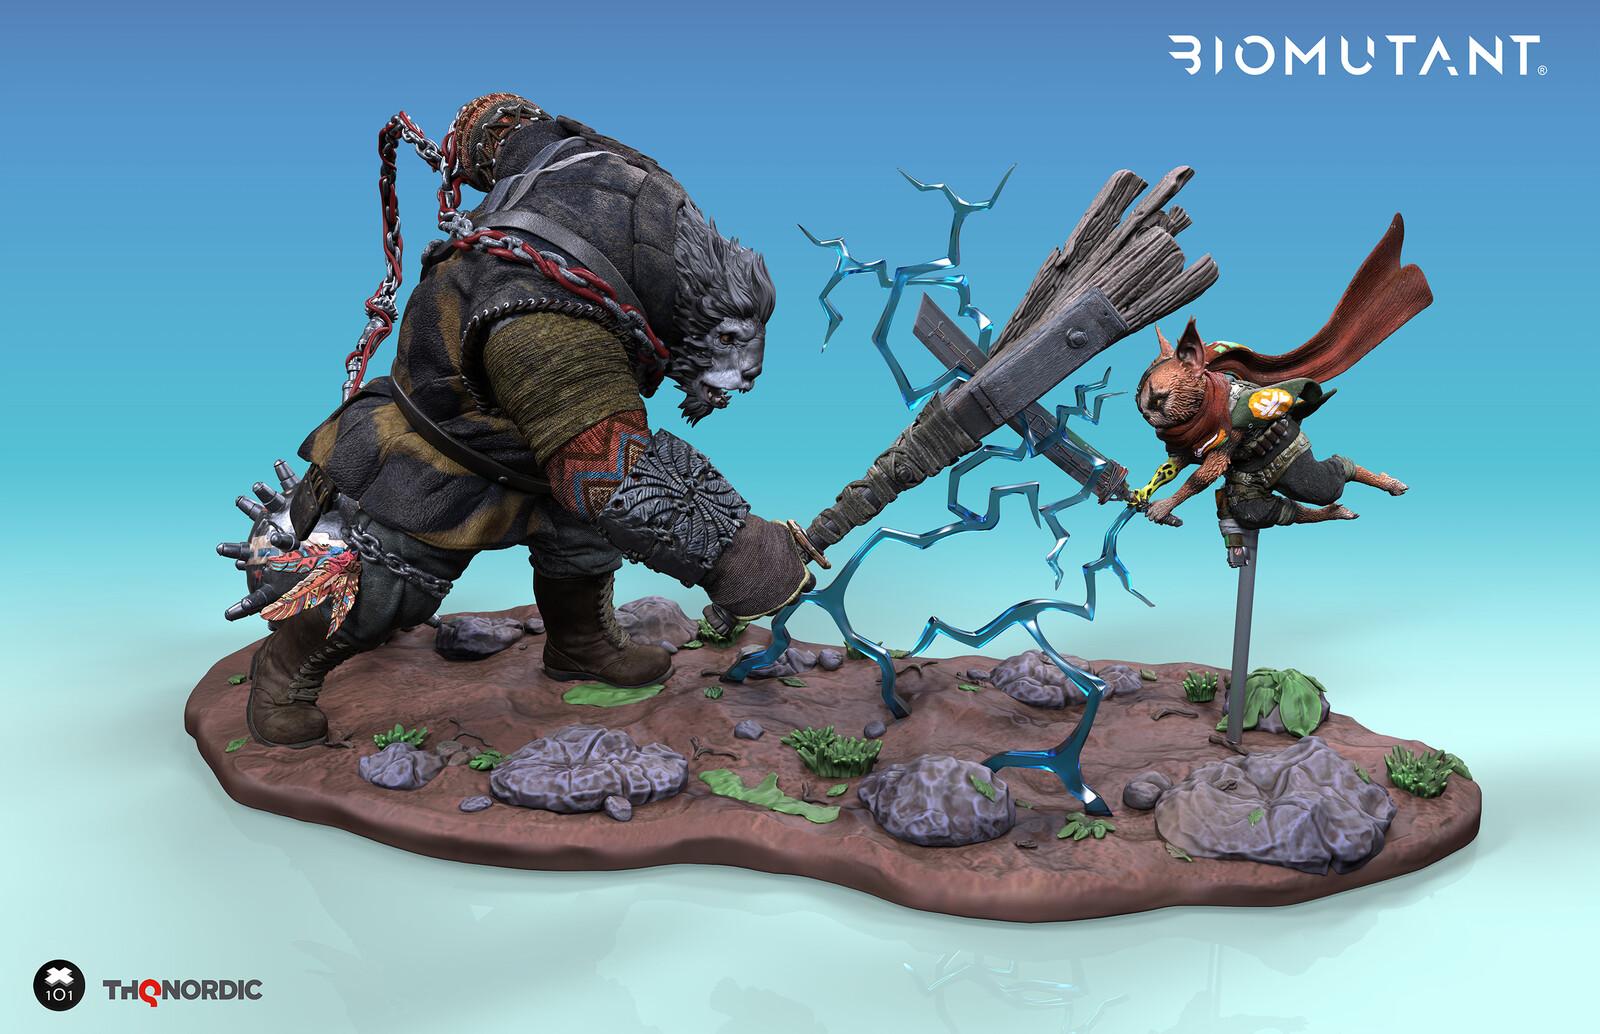 Biomutant Figurines